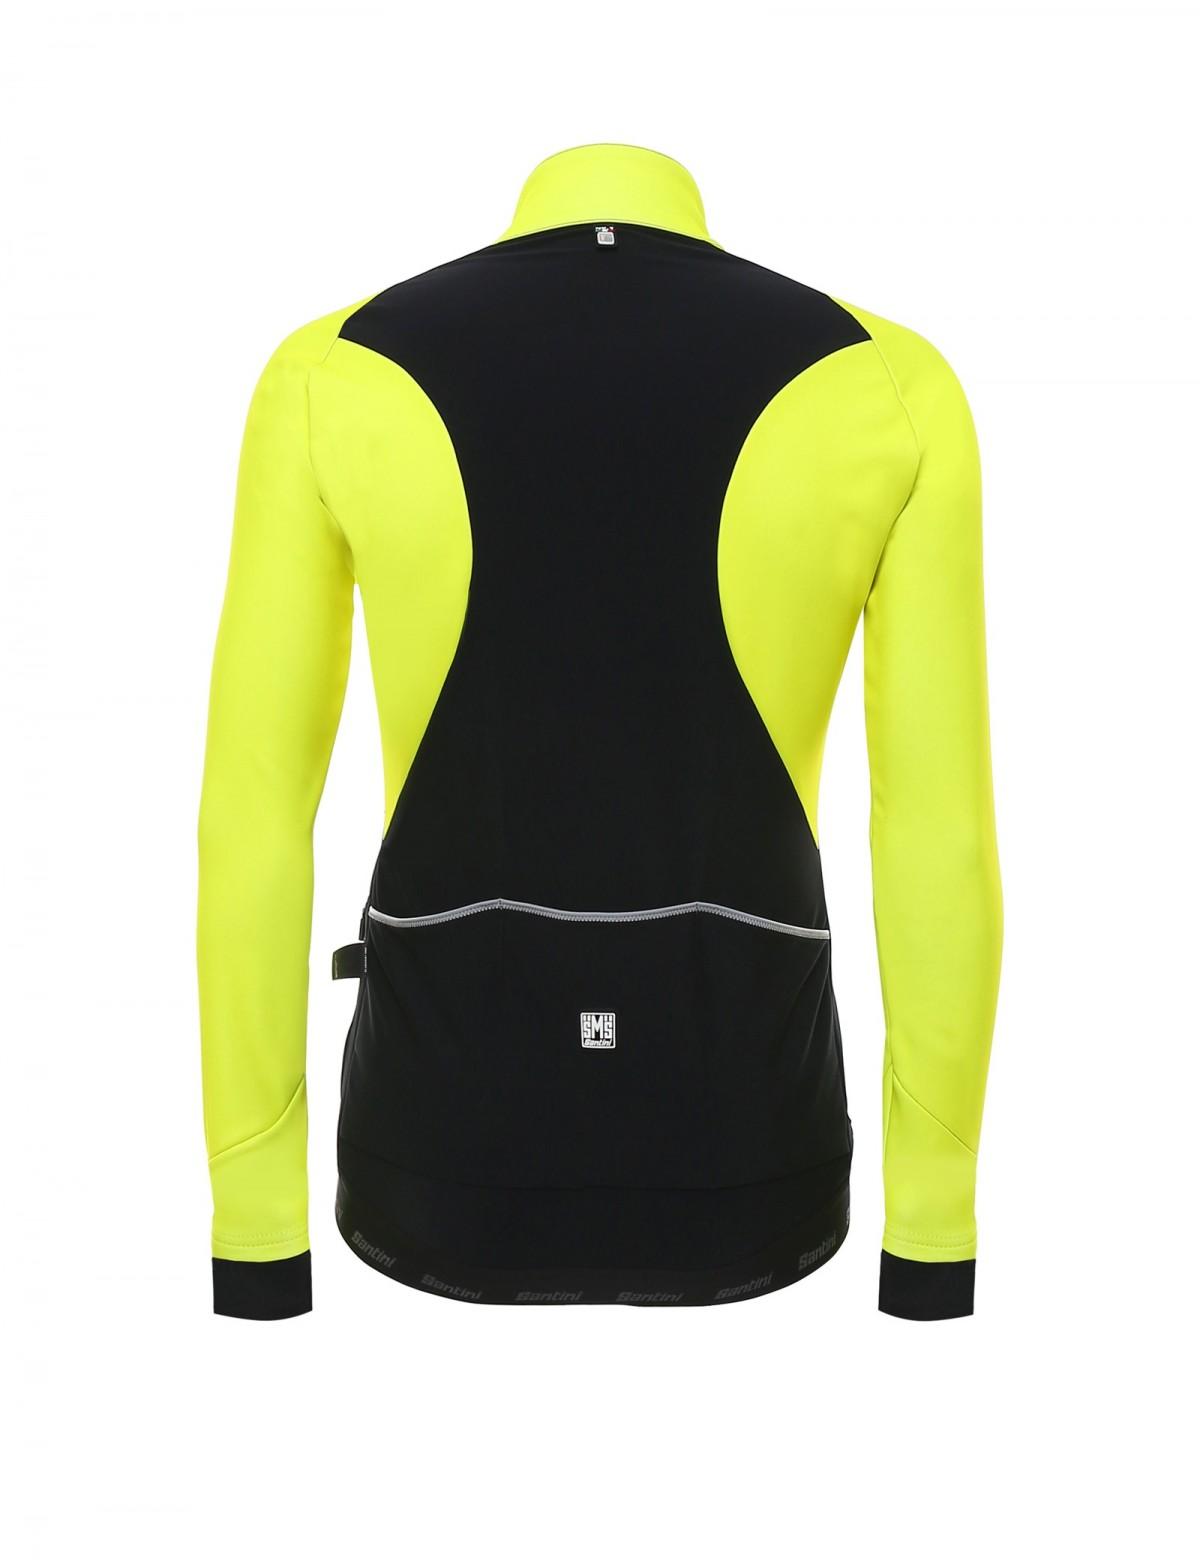 santini polar jacket review